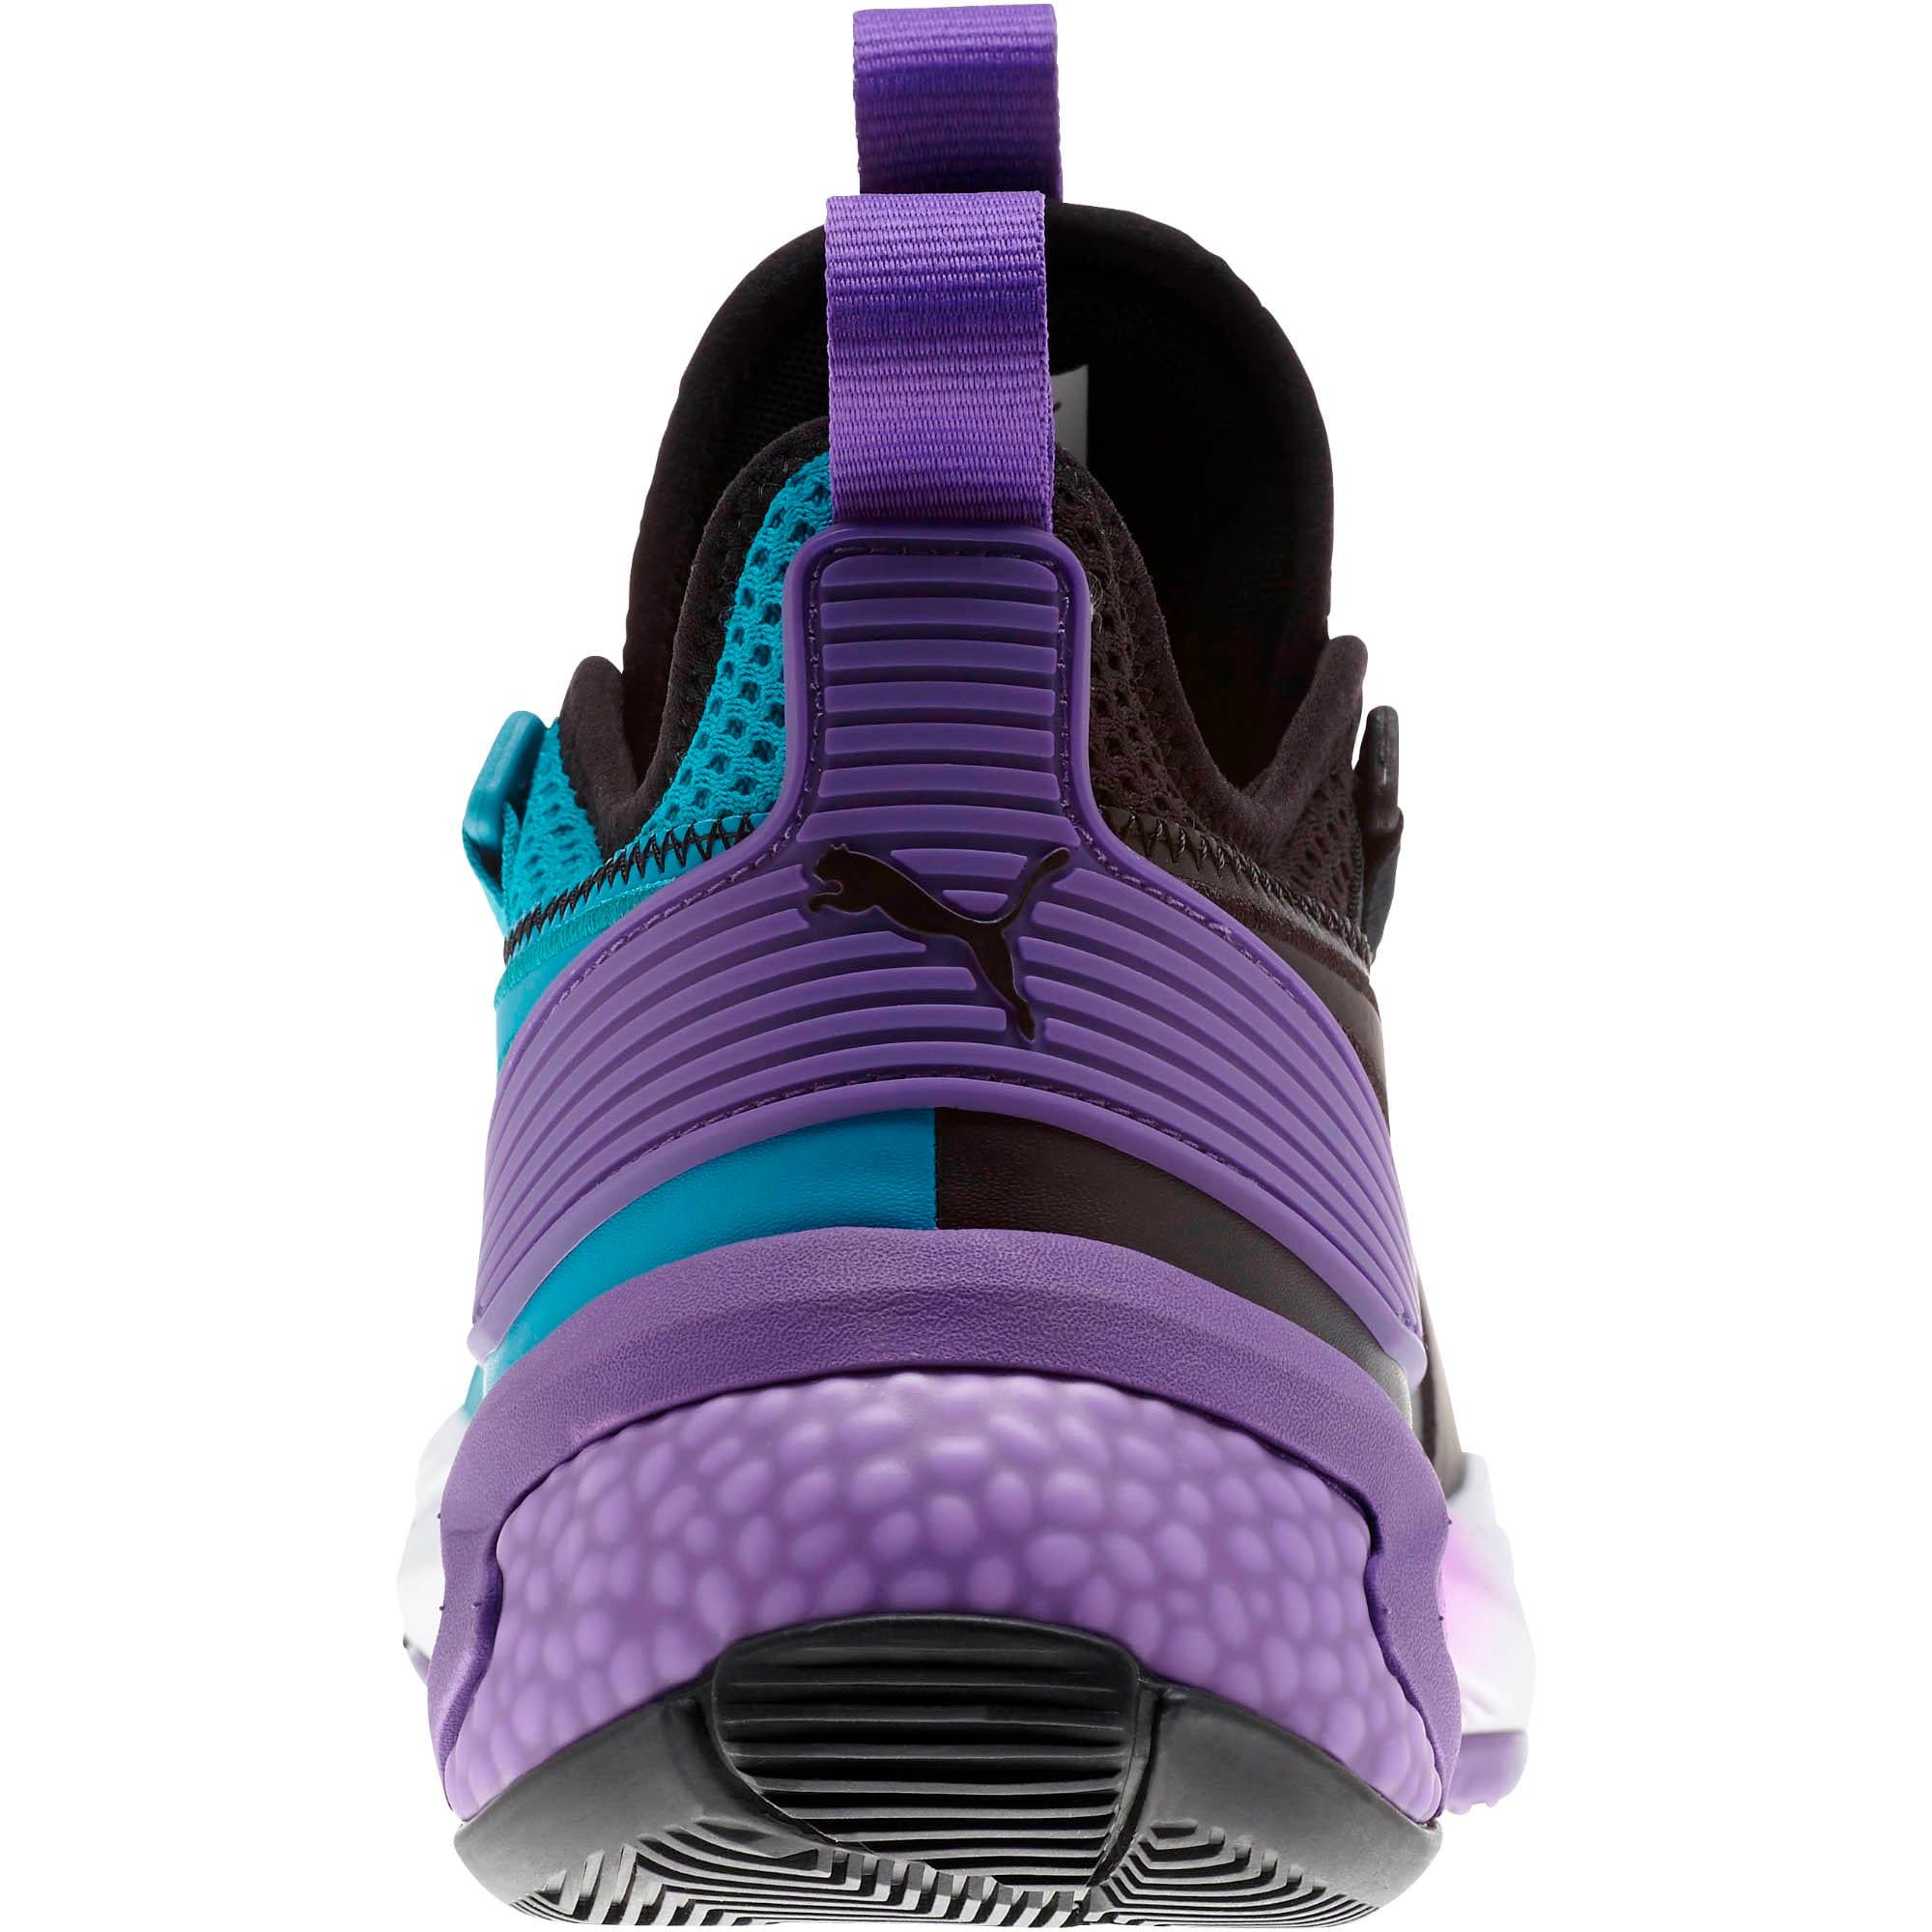 Thumbnail 3 of Uproar Charlotte ASG Fade Basketball Shoes, Orange- PURPLE, medium